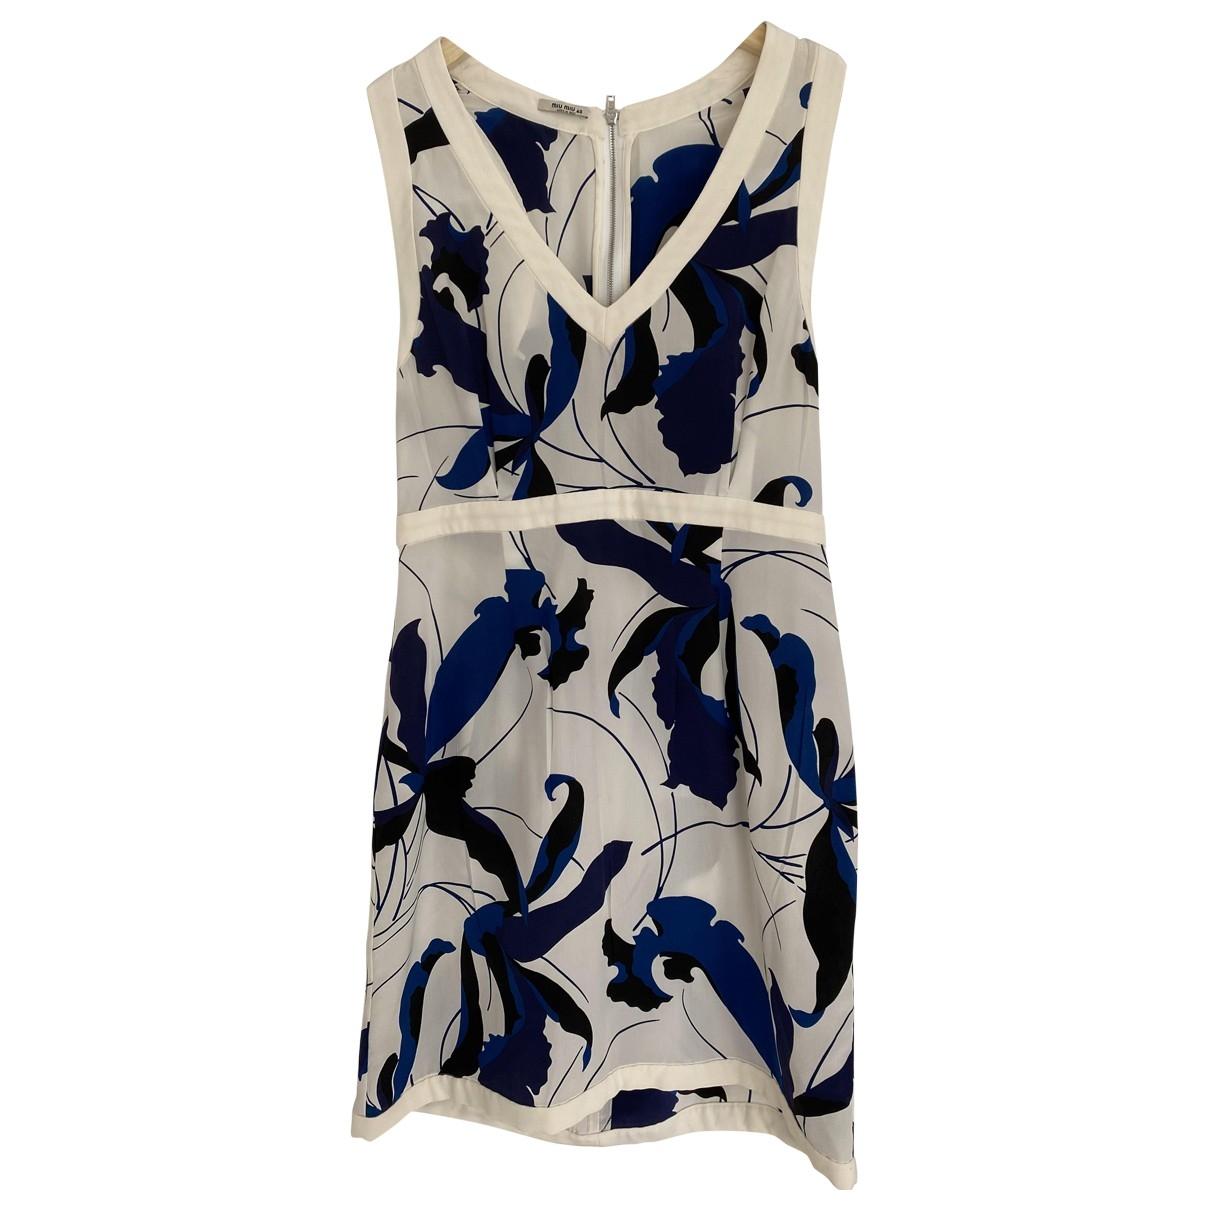 Miu Miu \N Multicolour Silk dress for Women 40 IT